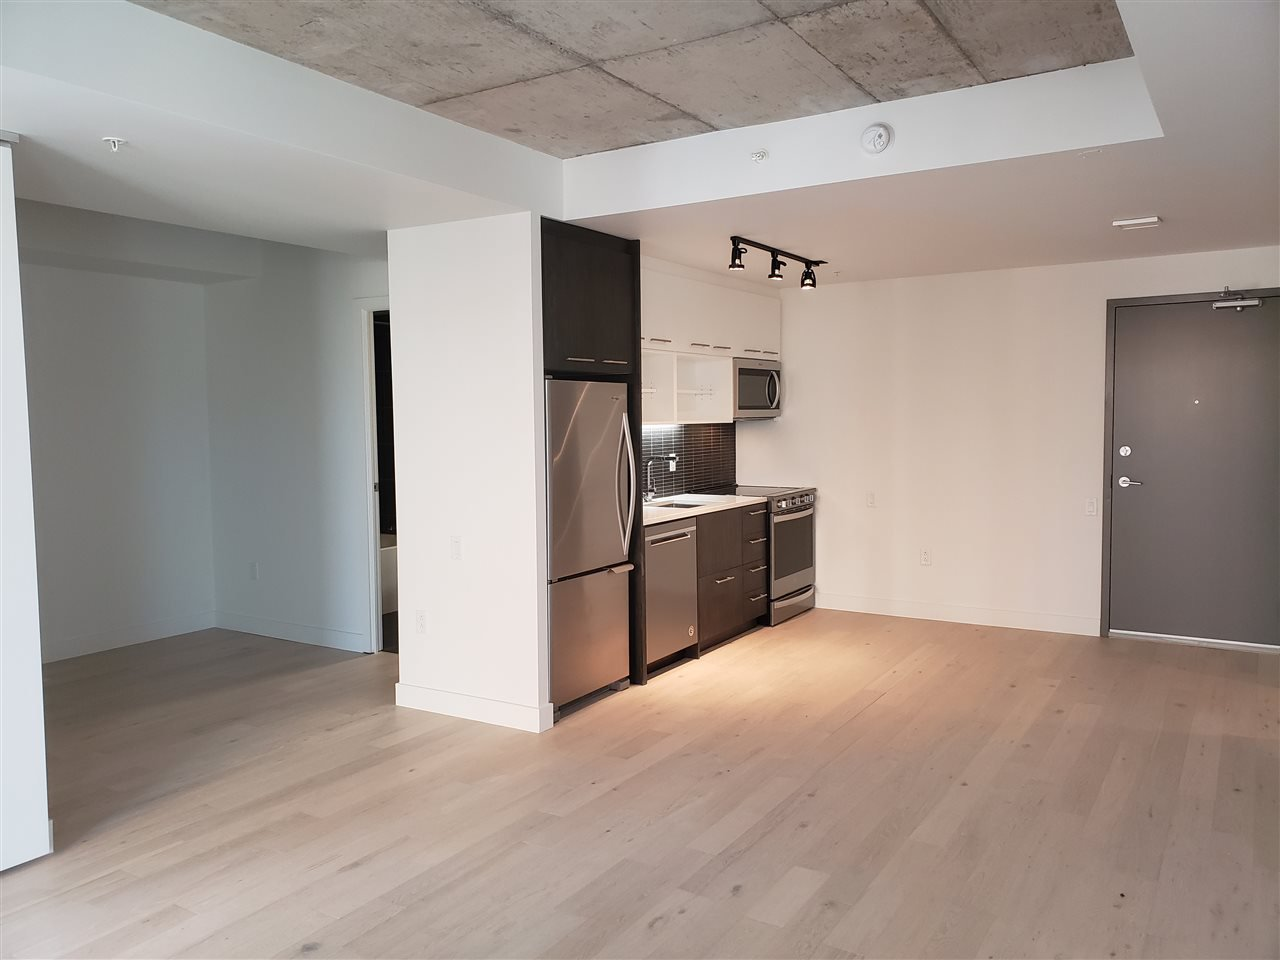 Photo 7: Photos: 316 1034 Wellington Street in Halifax: 2-Halifax South Residential for sale (Halifax-Dartmouth)  : MLS®# 201925647